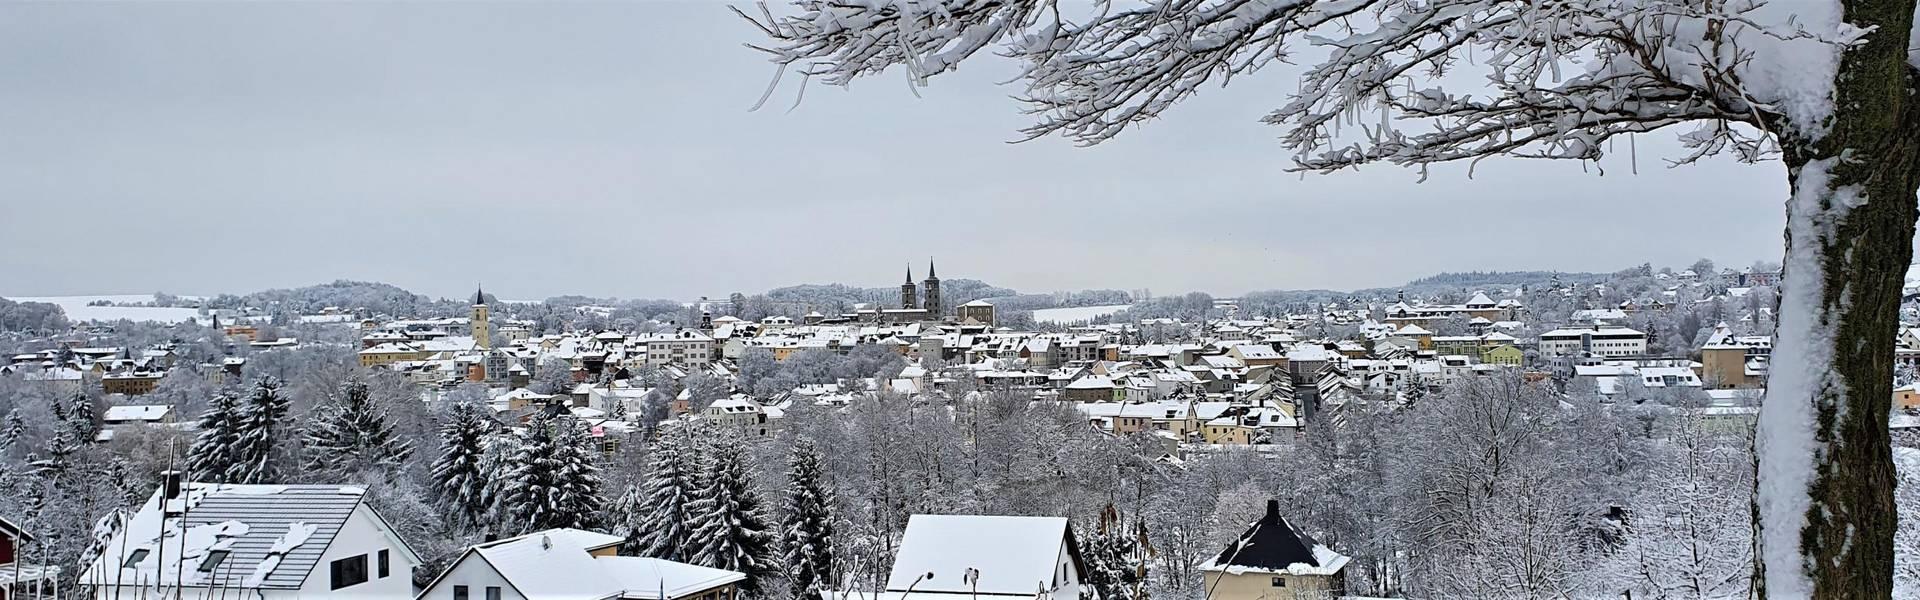 ©Landratsamt Saale-Orla-Kreis, Pressestelle